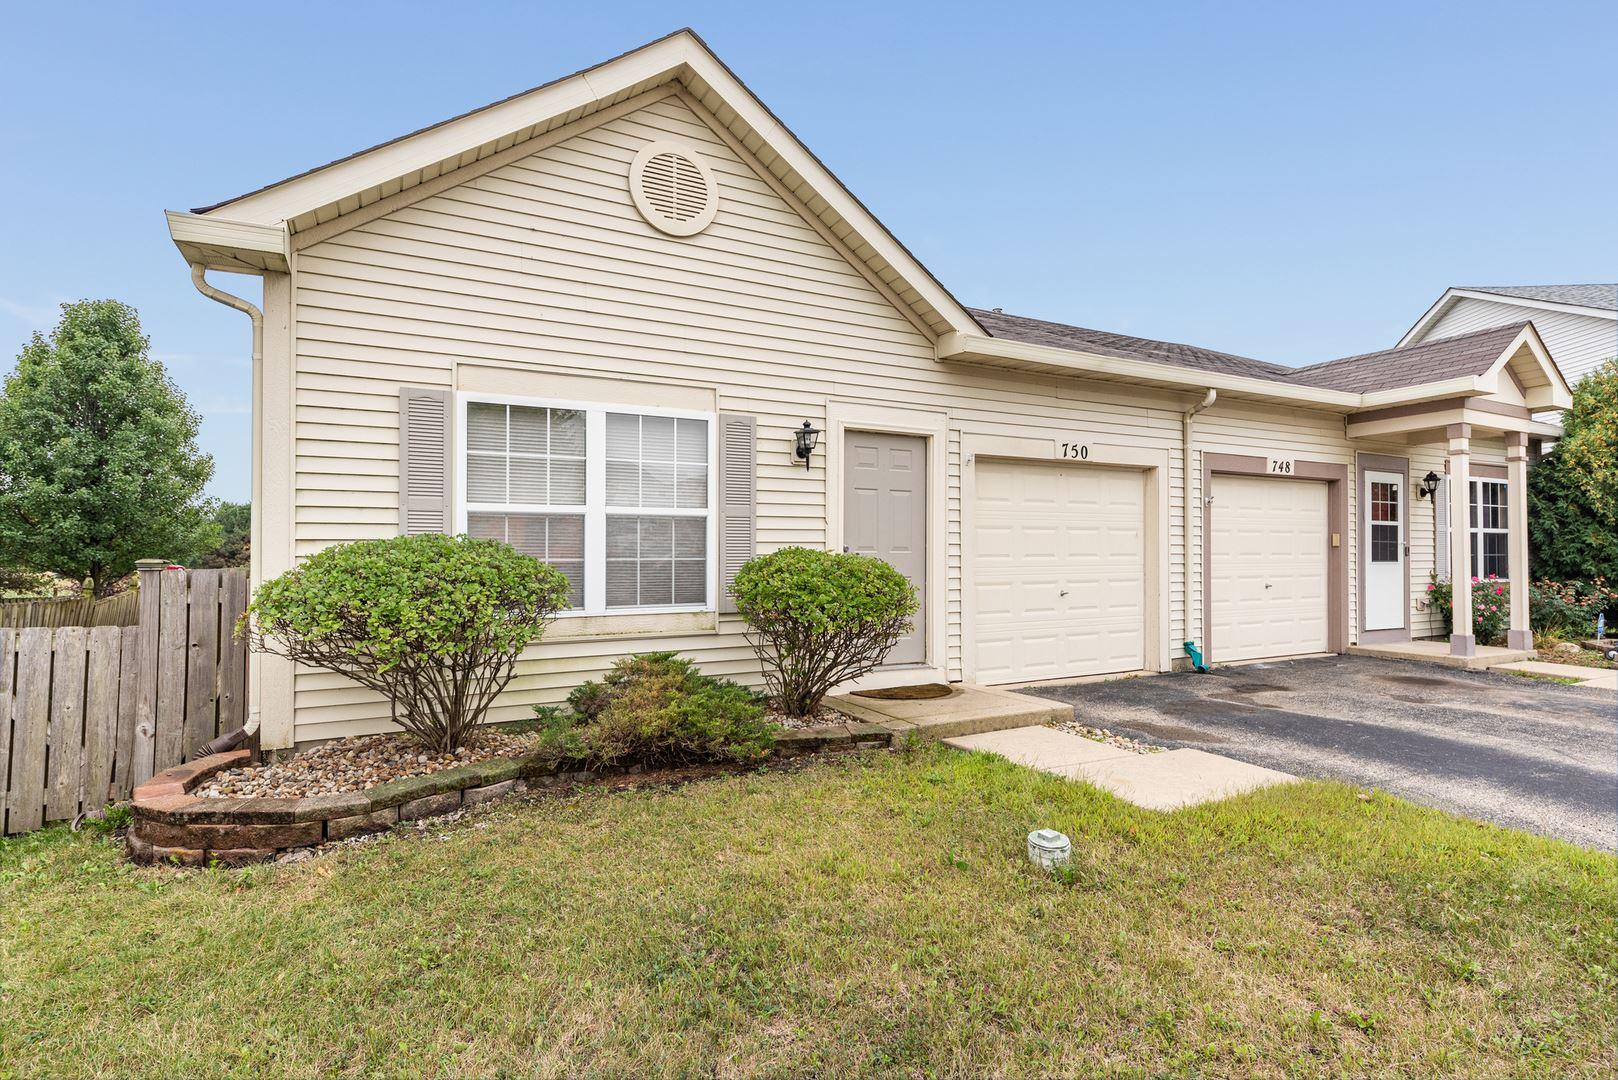 Photo of 750 Bayles Drive, Romeoville, IL 60446 (MLS # 10853221)